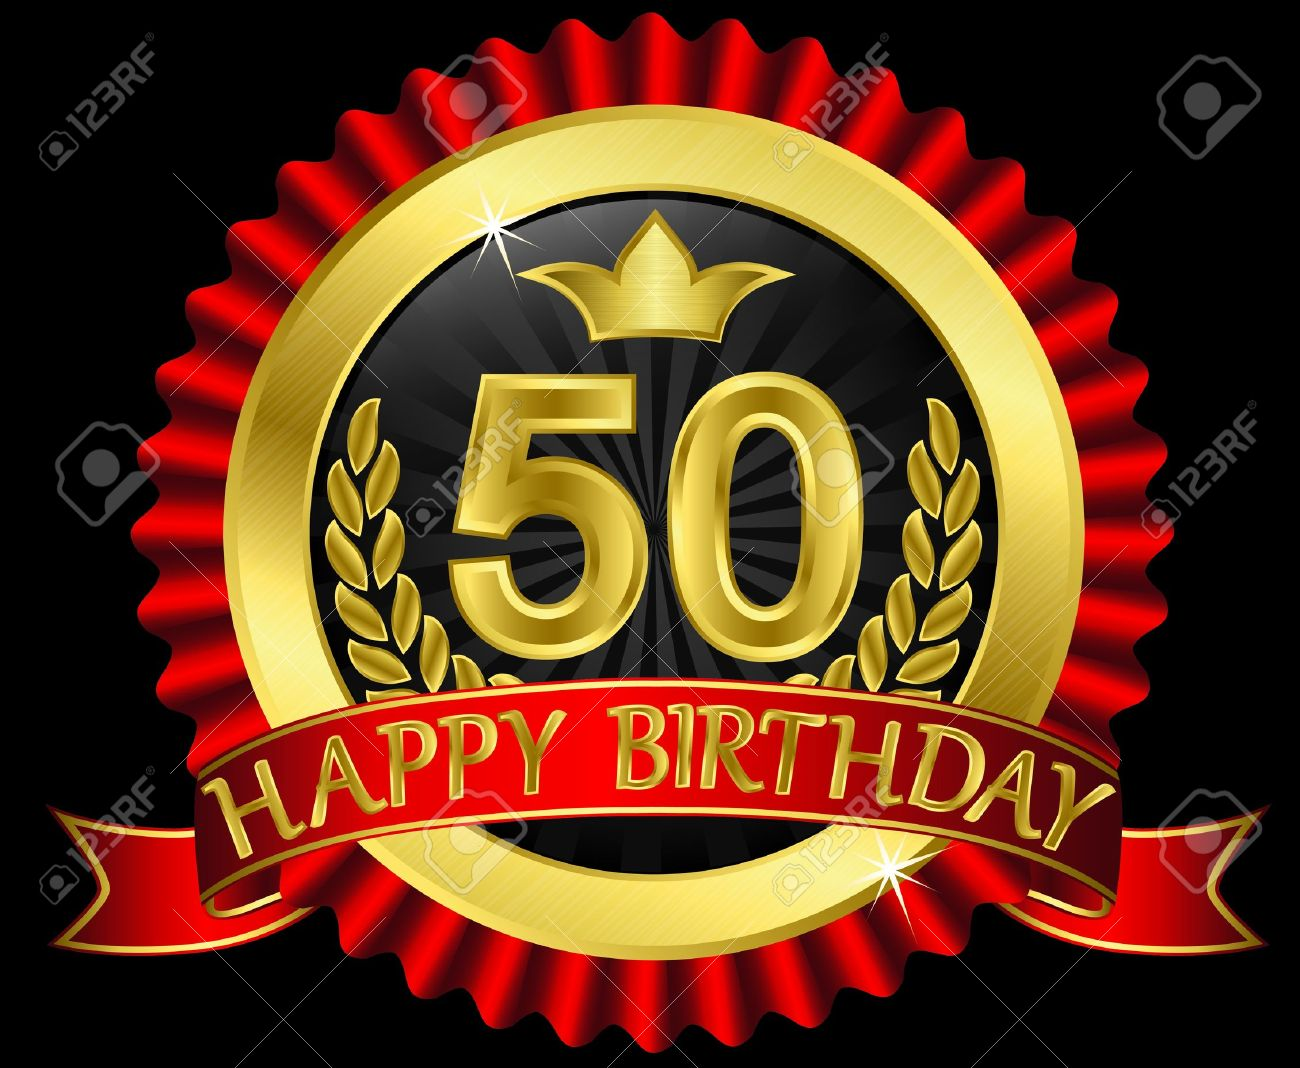 50 years happy birthday